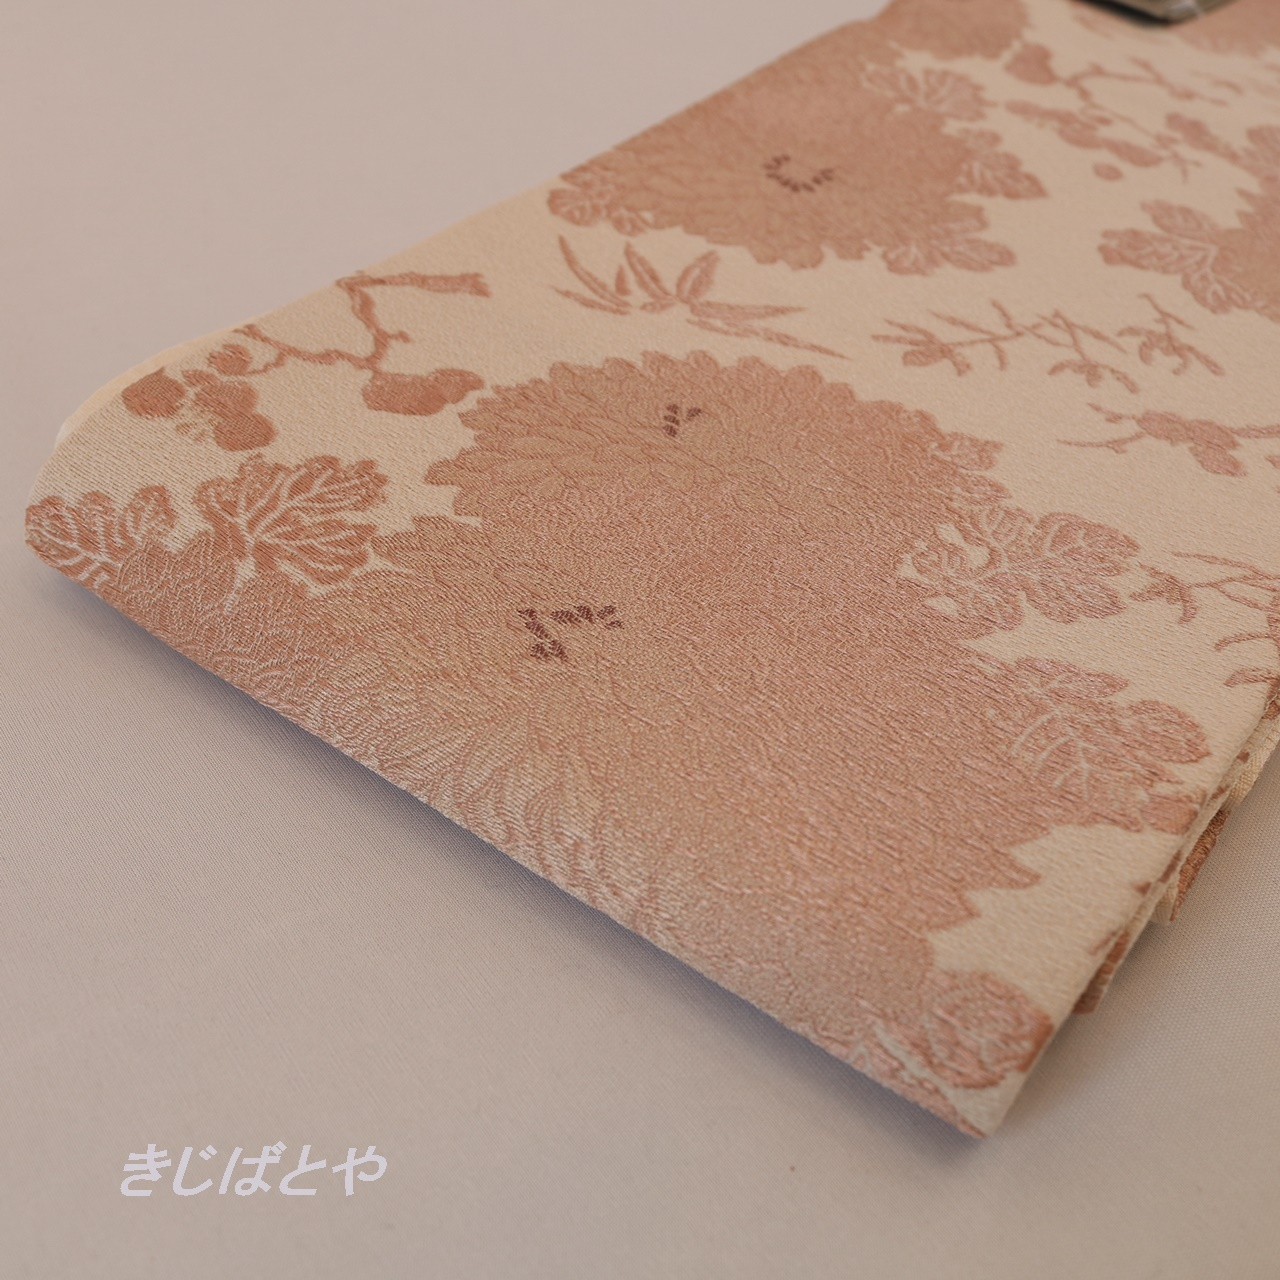 【N様ご予約品】桐生織 ピンクベージュの半幅帯